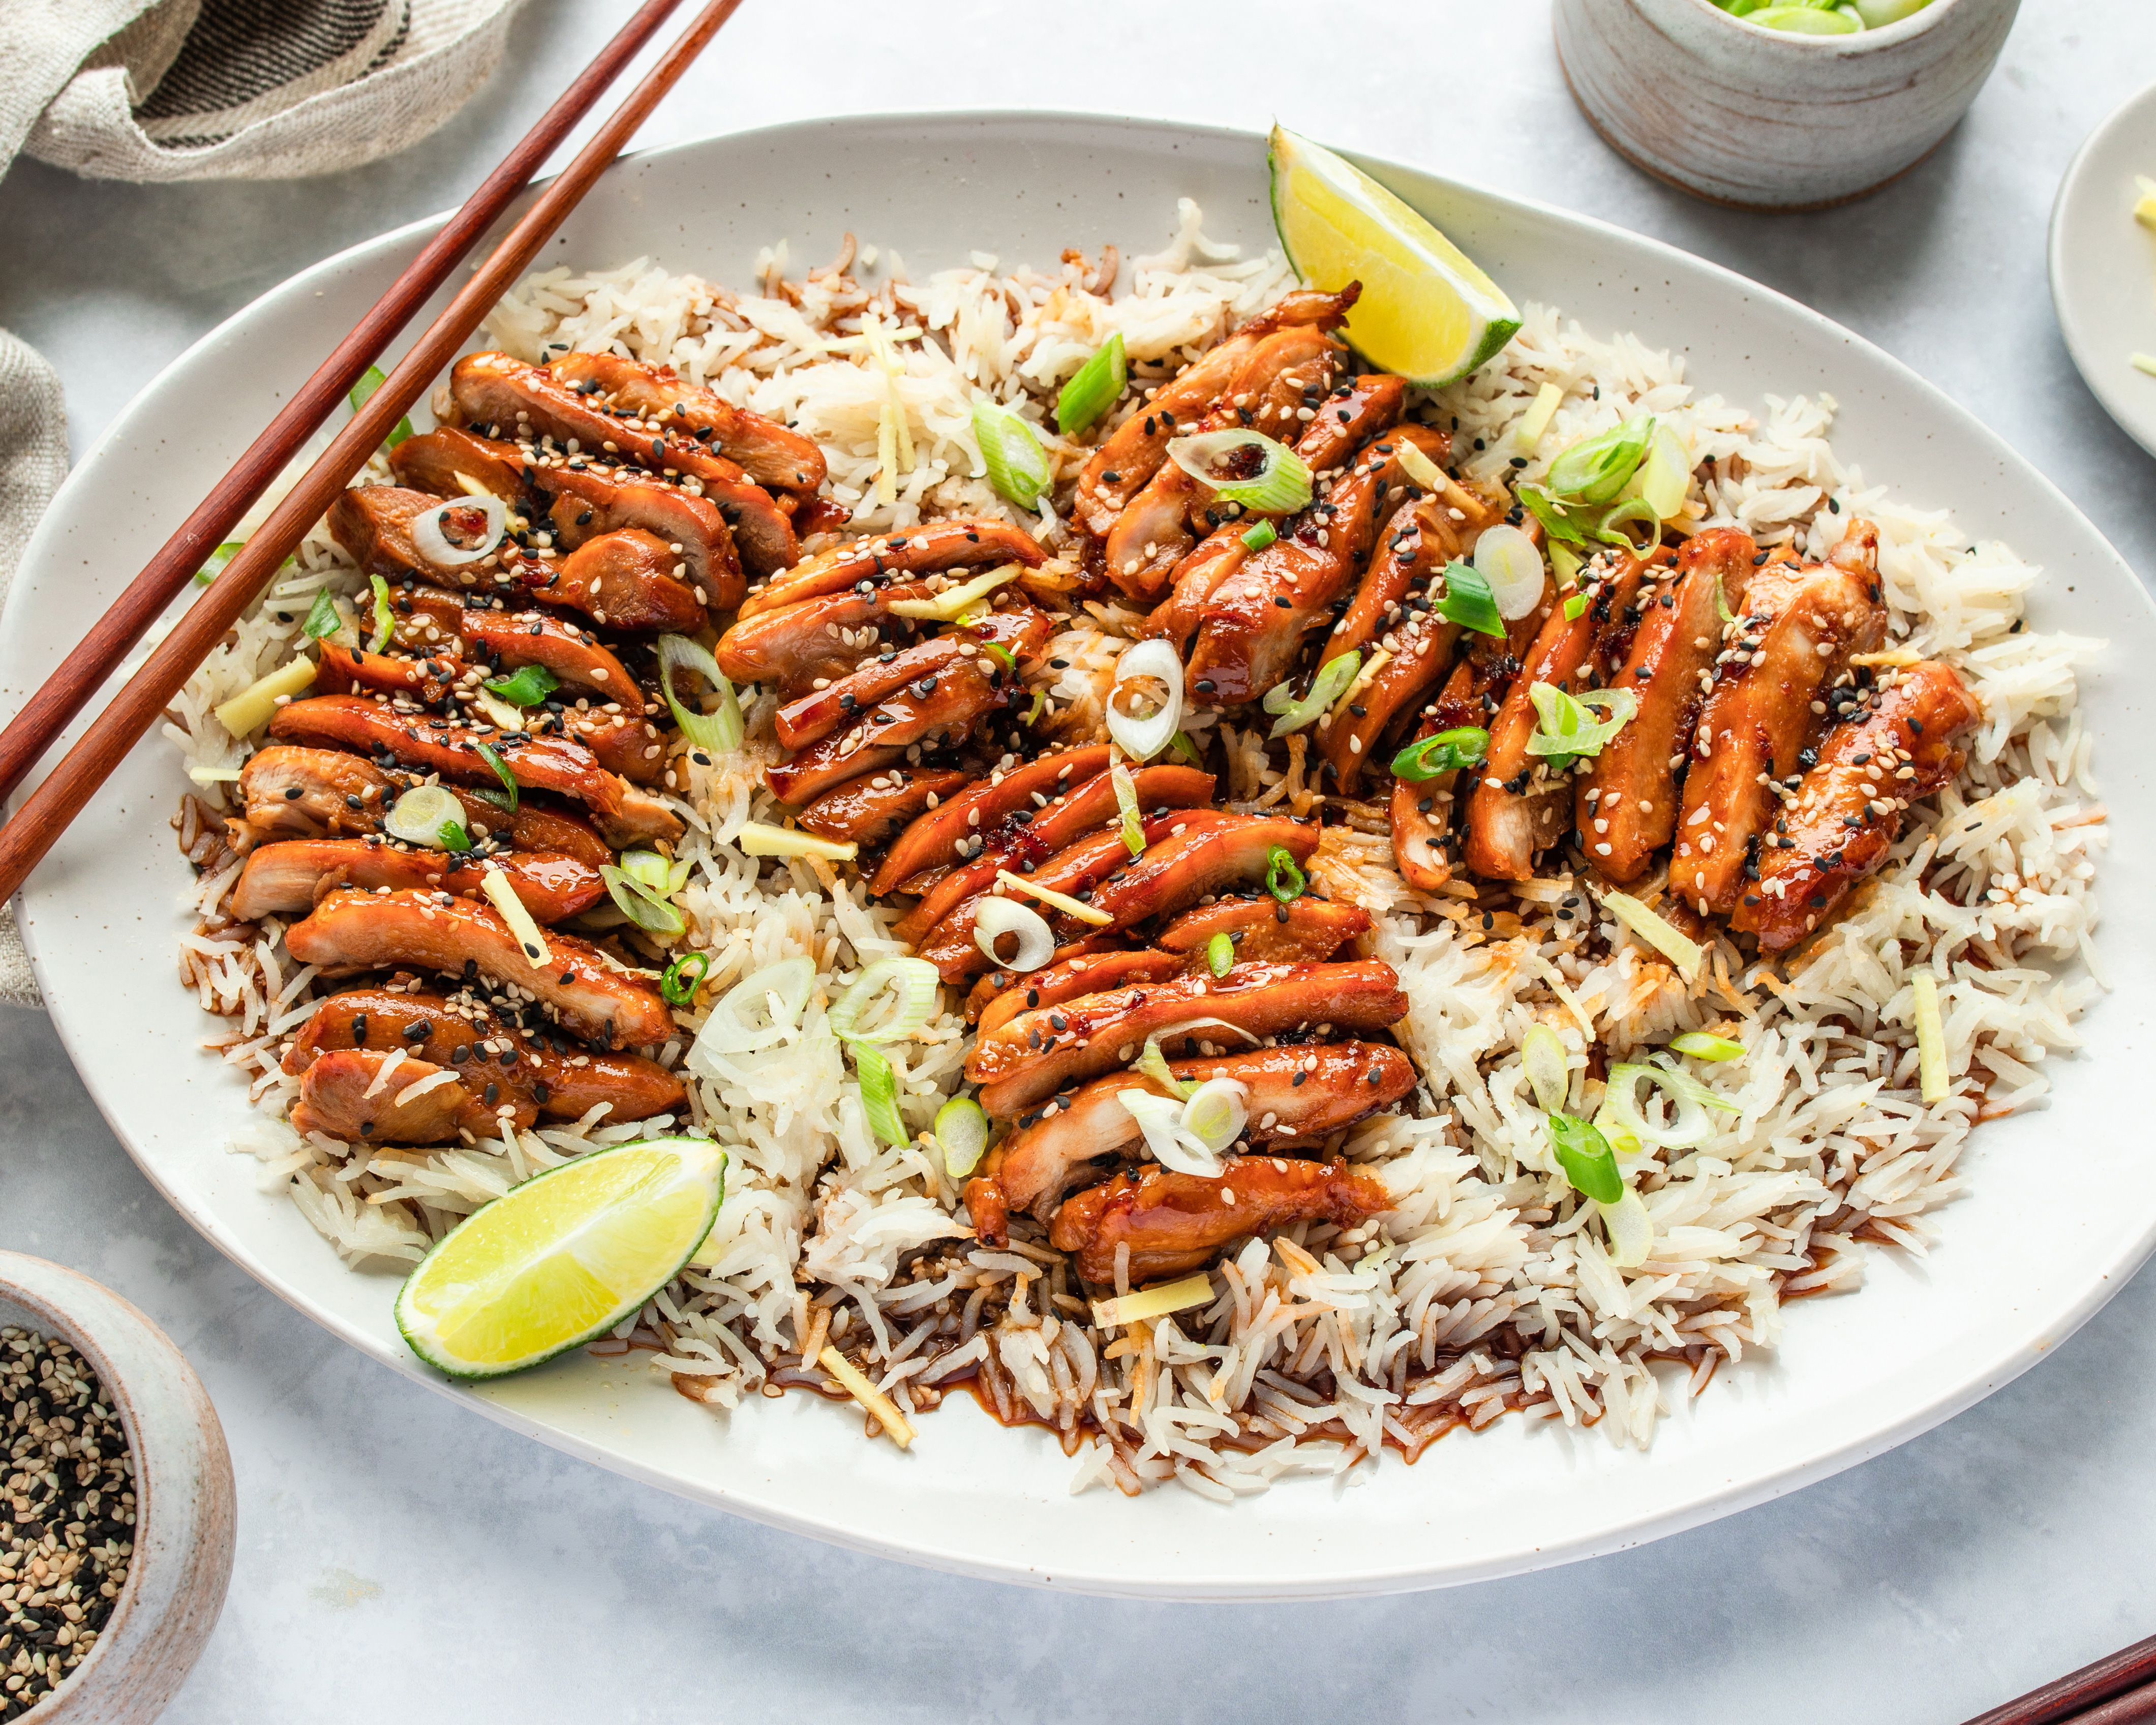 Easy Recipe for Delicious Japanese Restaurant Style Teriyaki Chicken